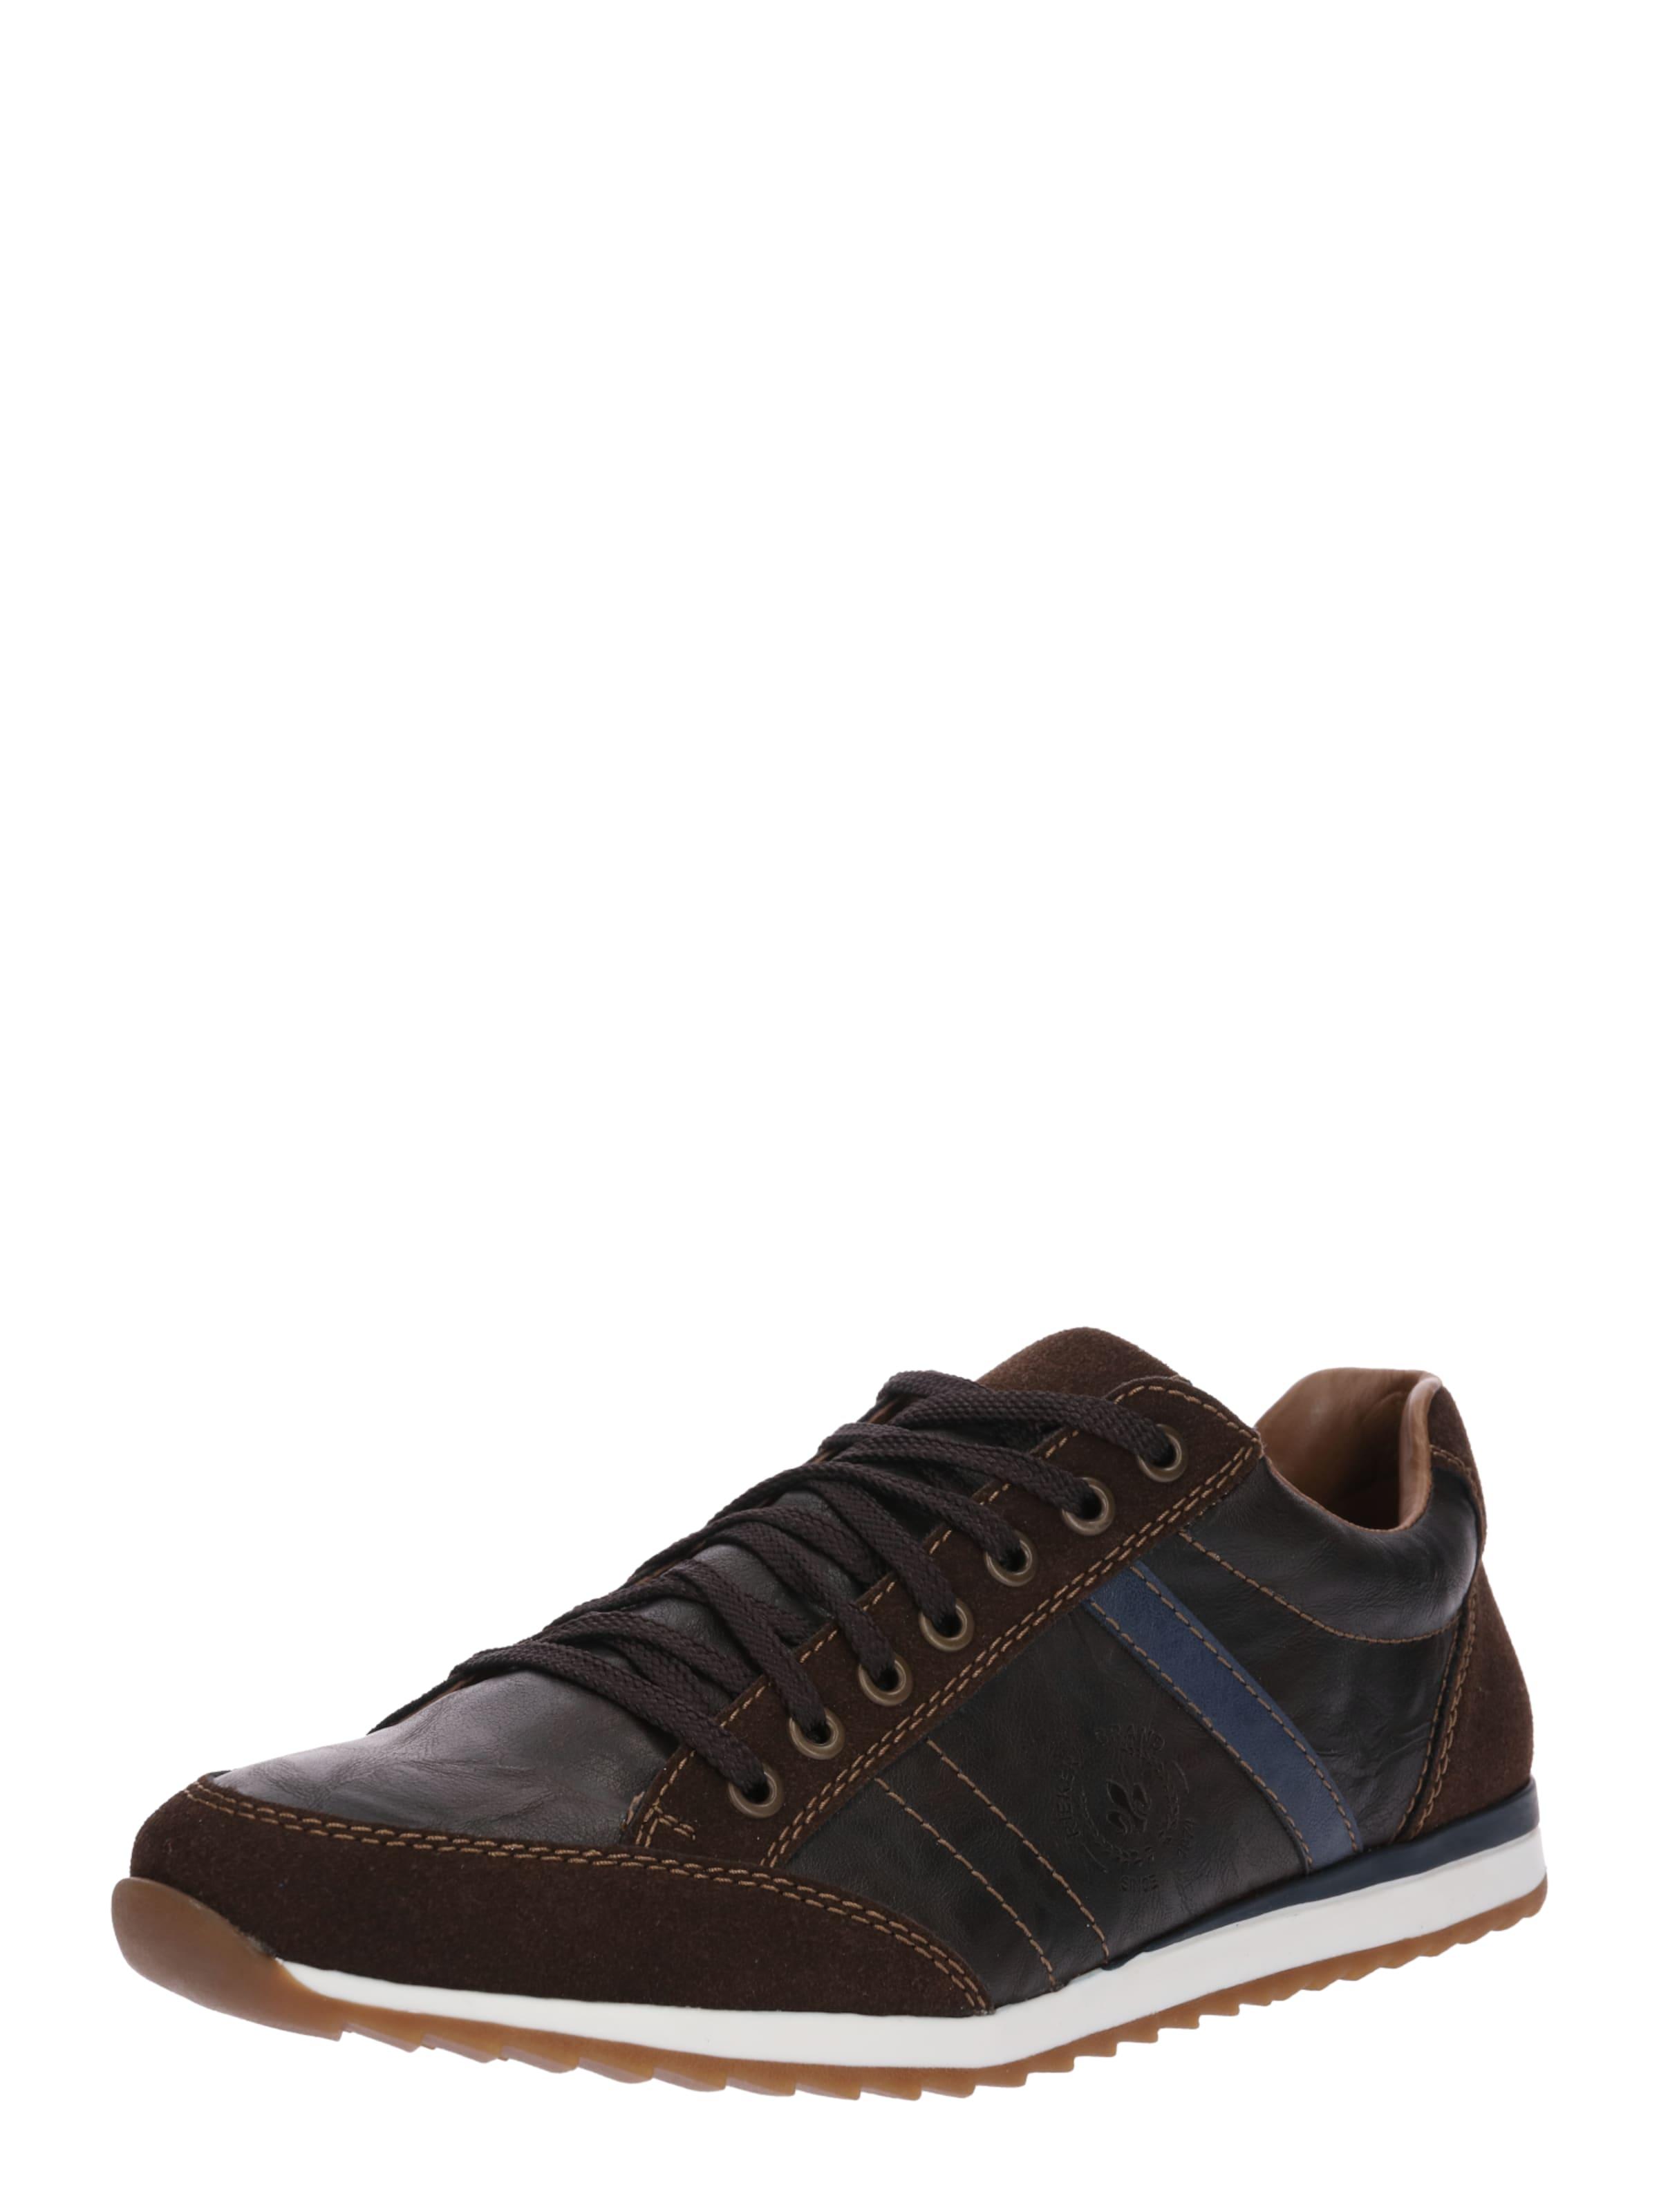 RIEKER Sneaker Low in Leder-Optik Hohe Qualität